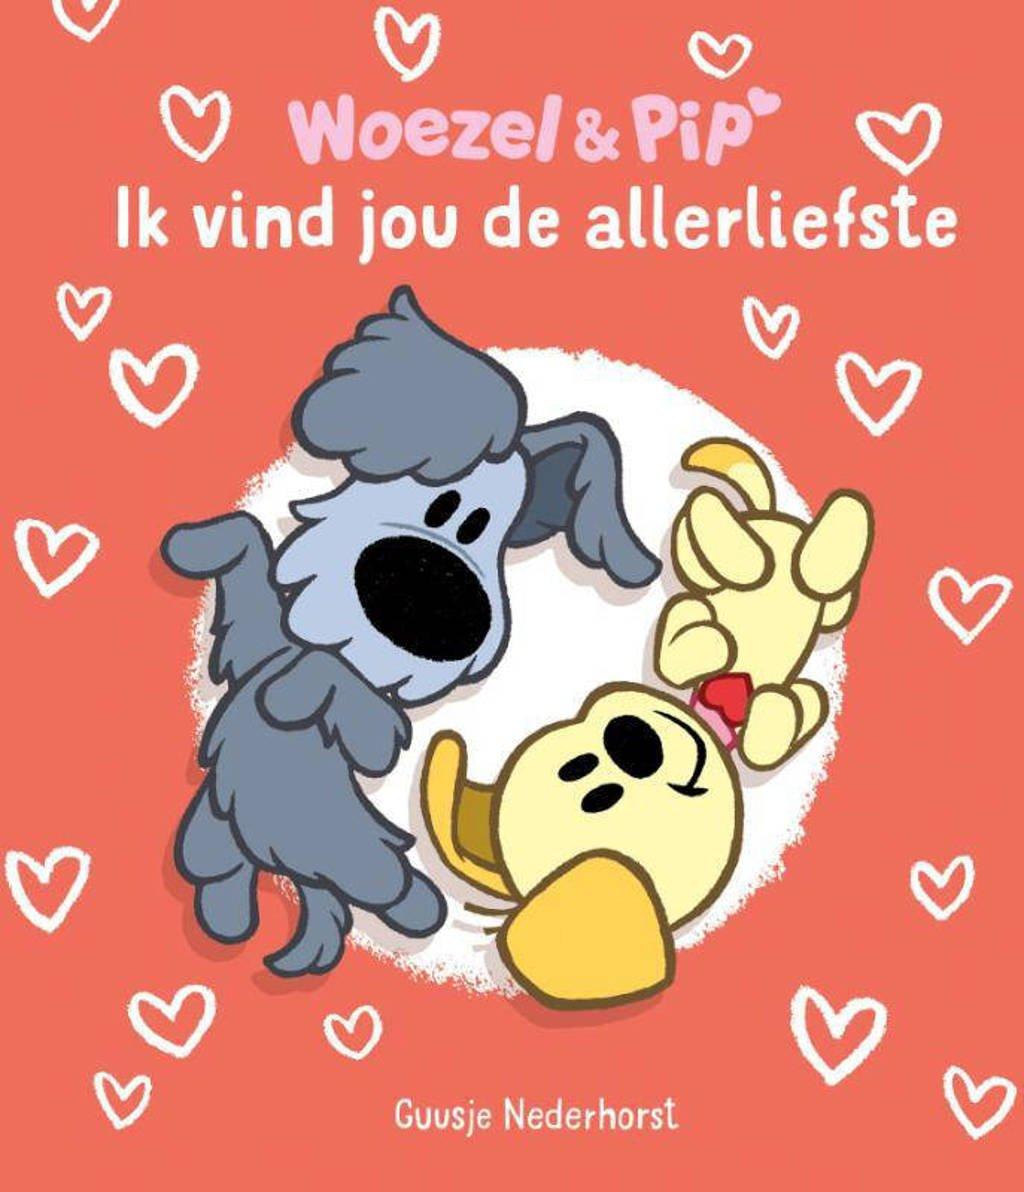 Woezel & Pip: Ik vind jou de allerliefste - Guusje Nederhorst en